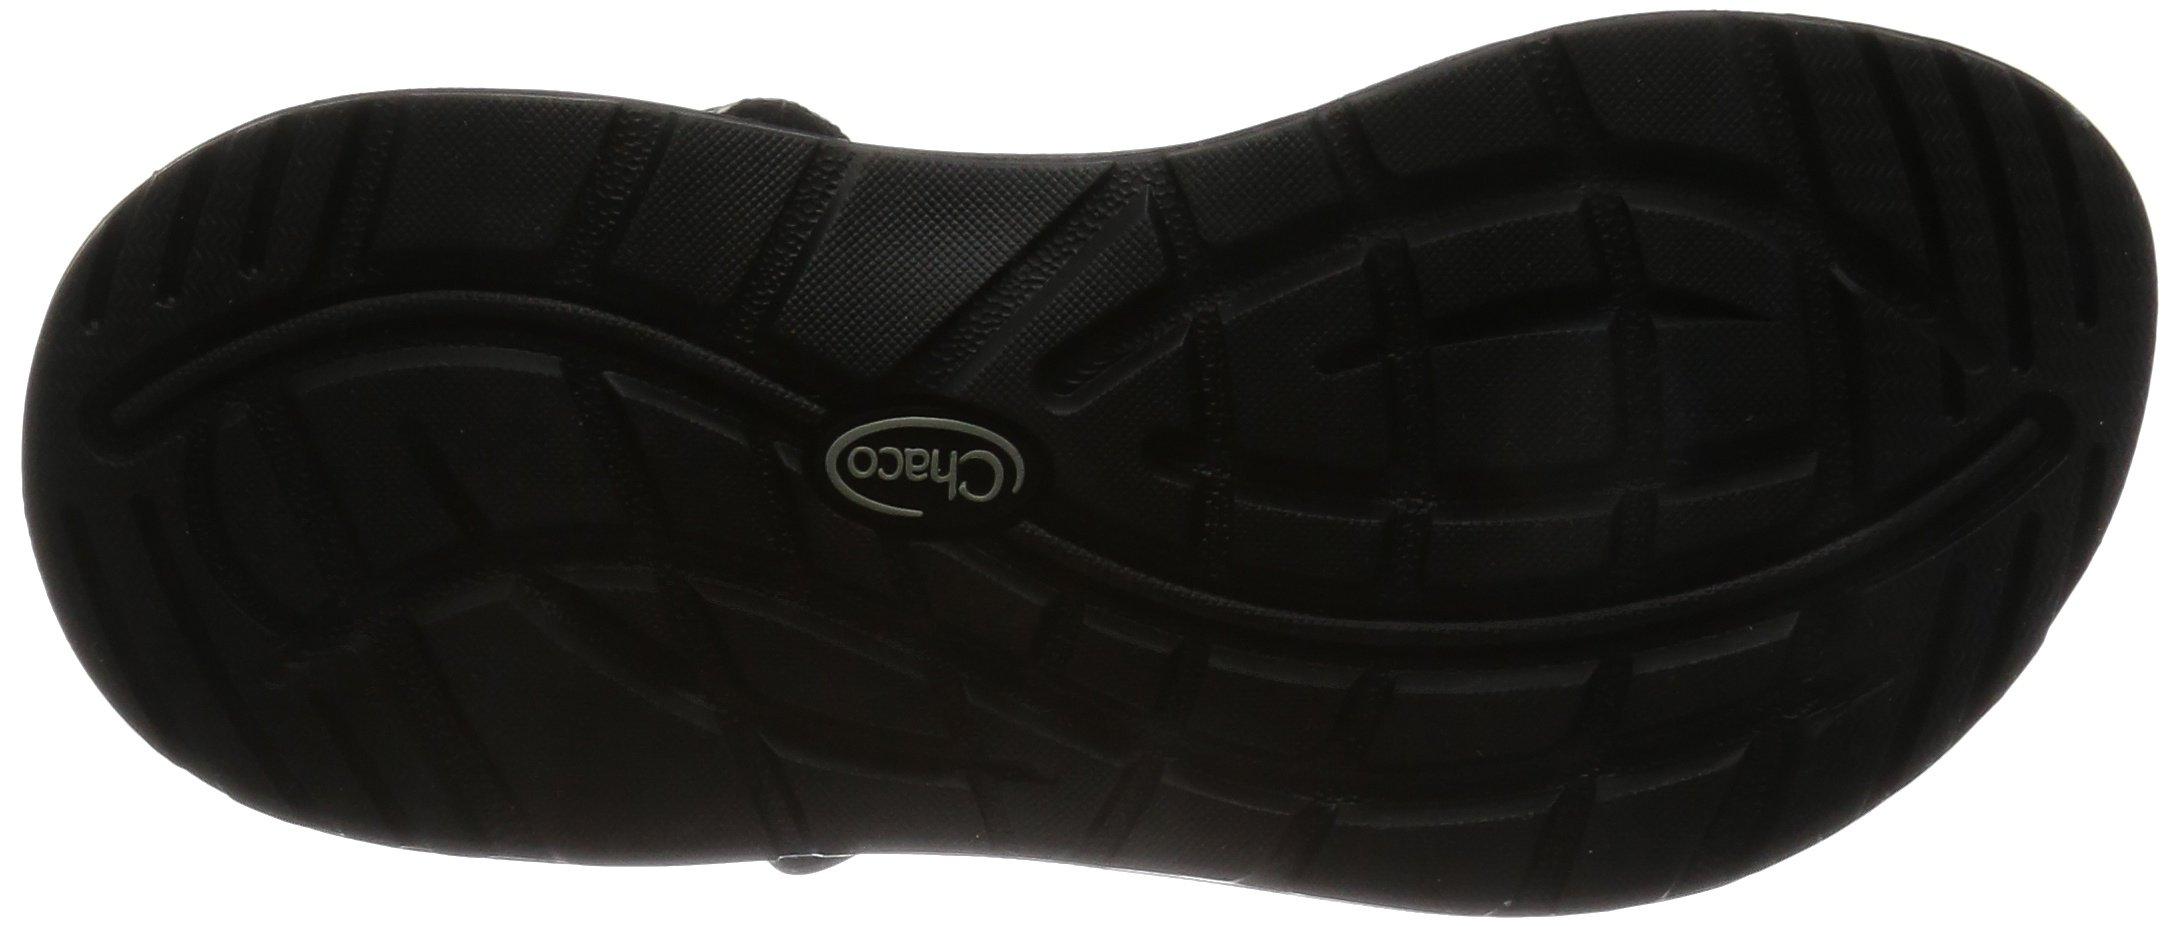 Chaco Women's Zcloud Sport Sandal, Venetian Black, 9 M US by Chaco (Image #3)